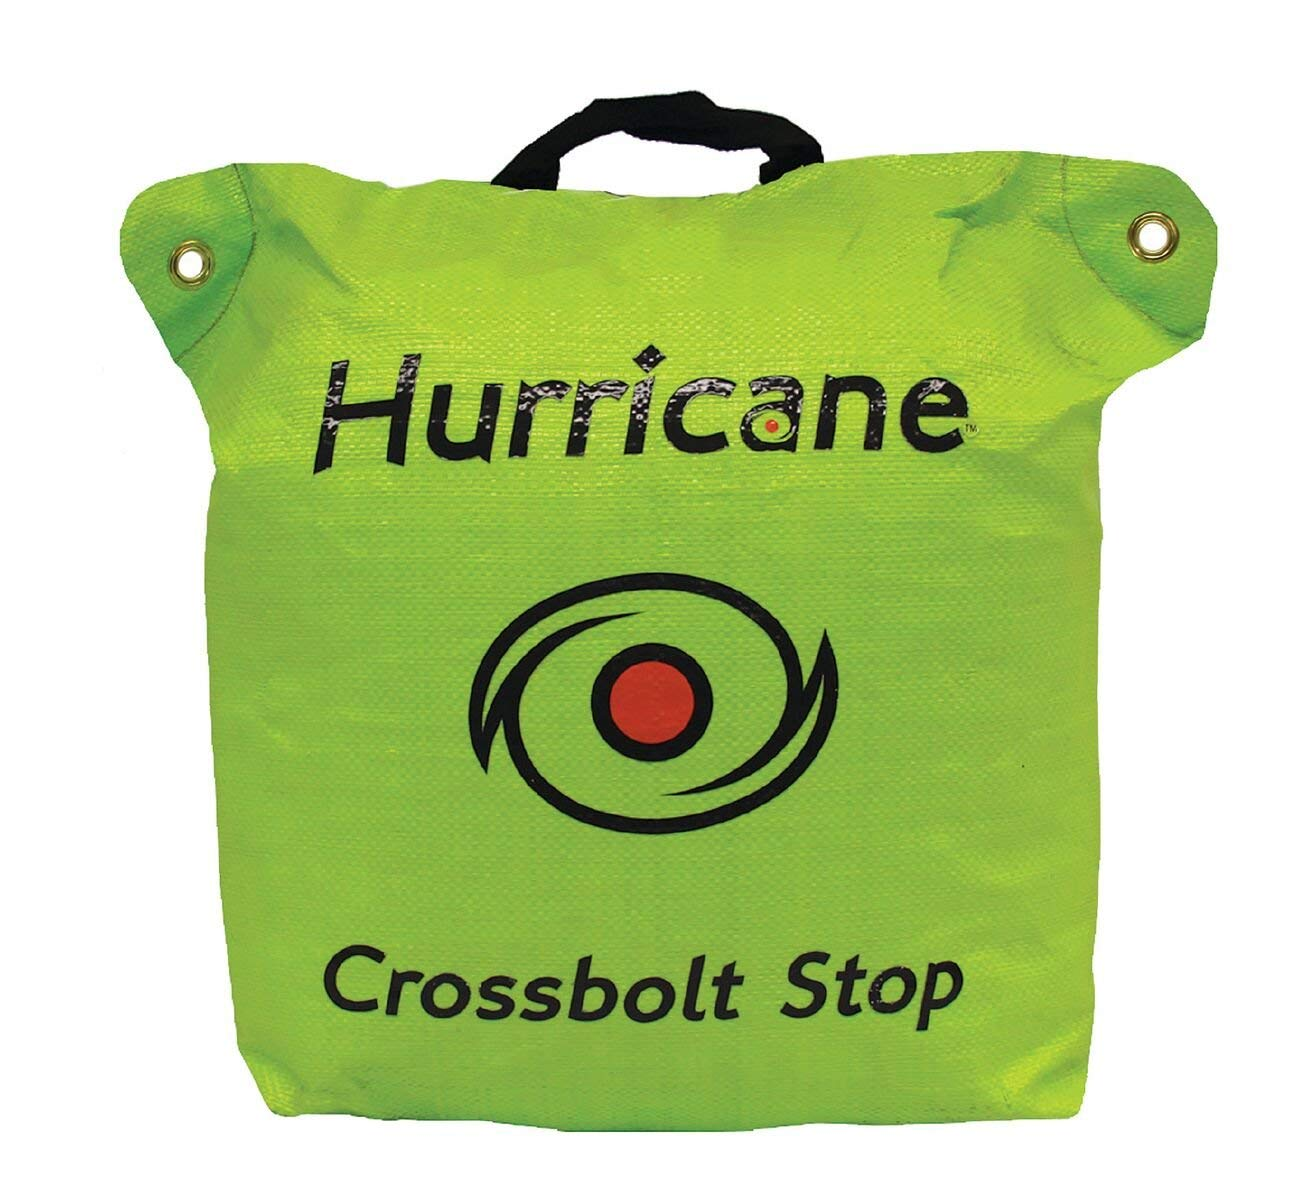 Hurricane H12 Cross bolt Stop Target